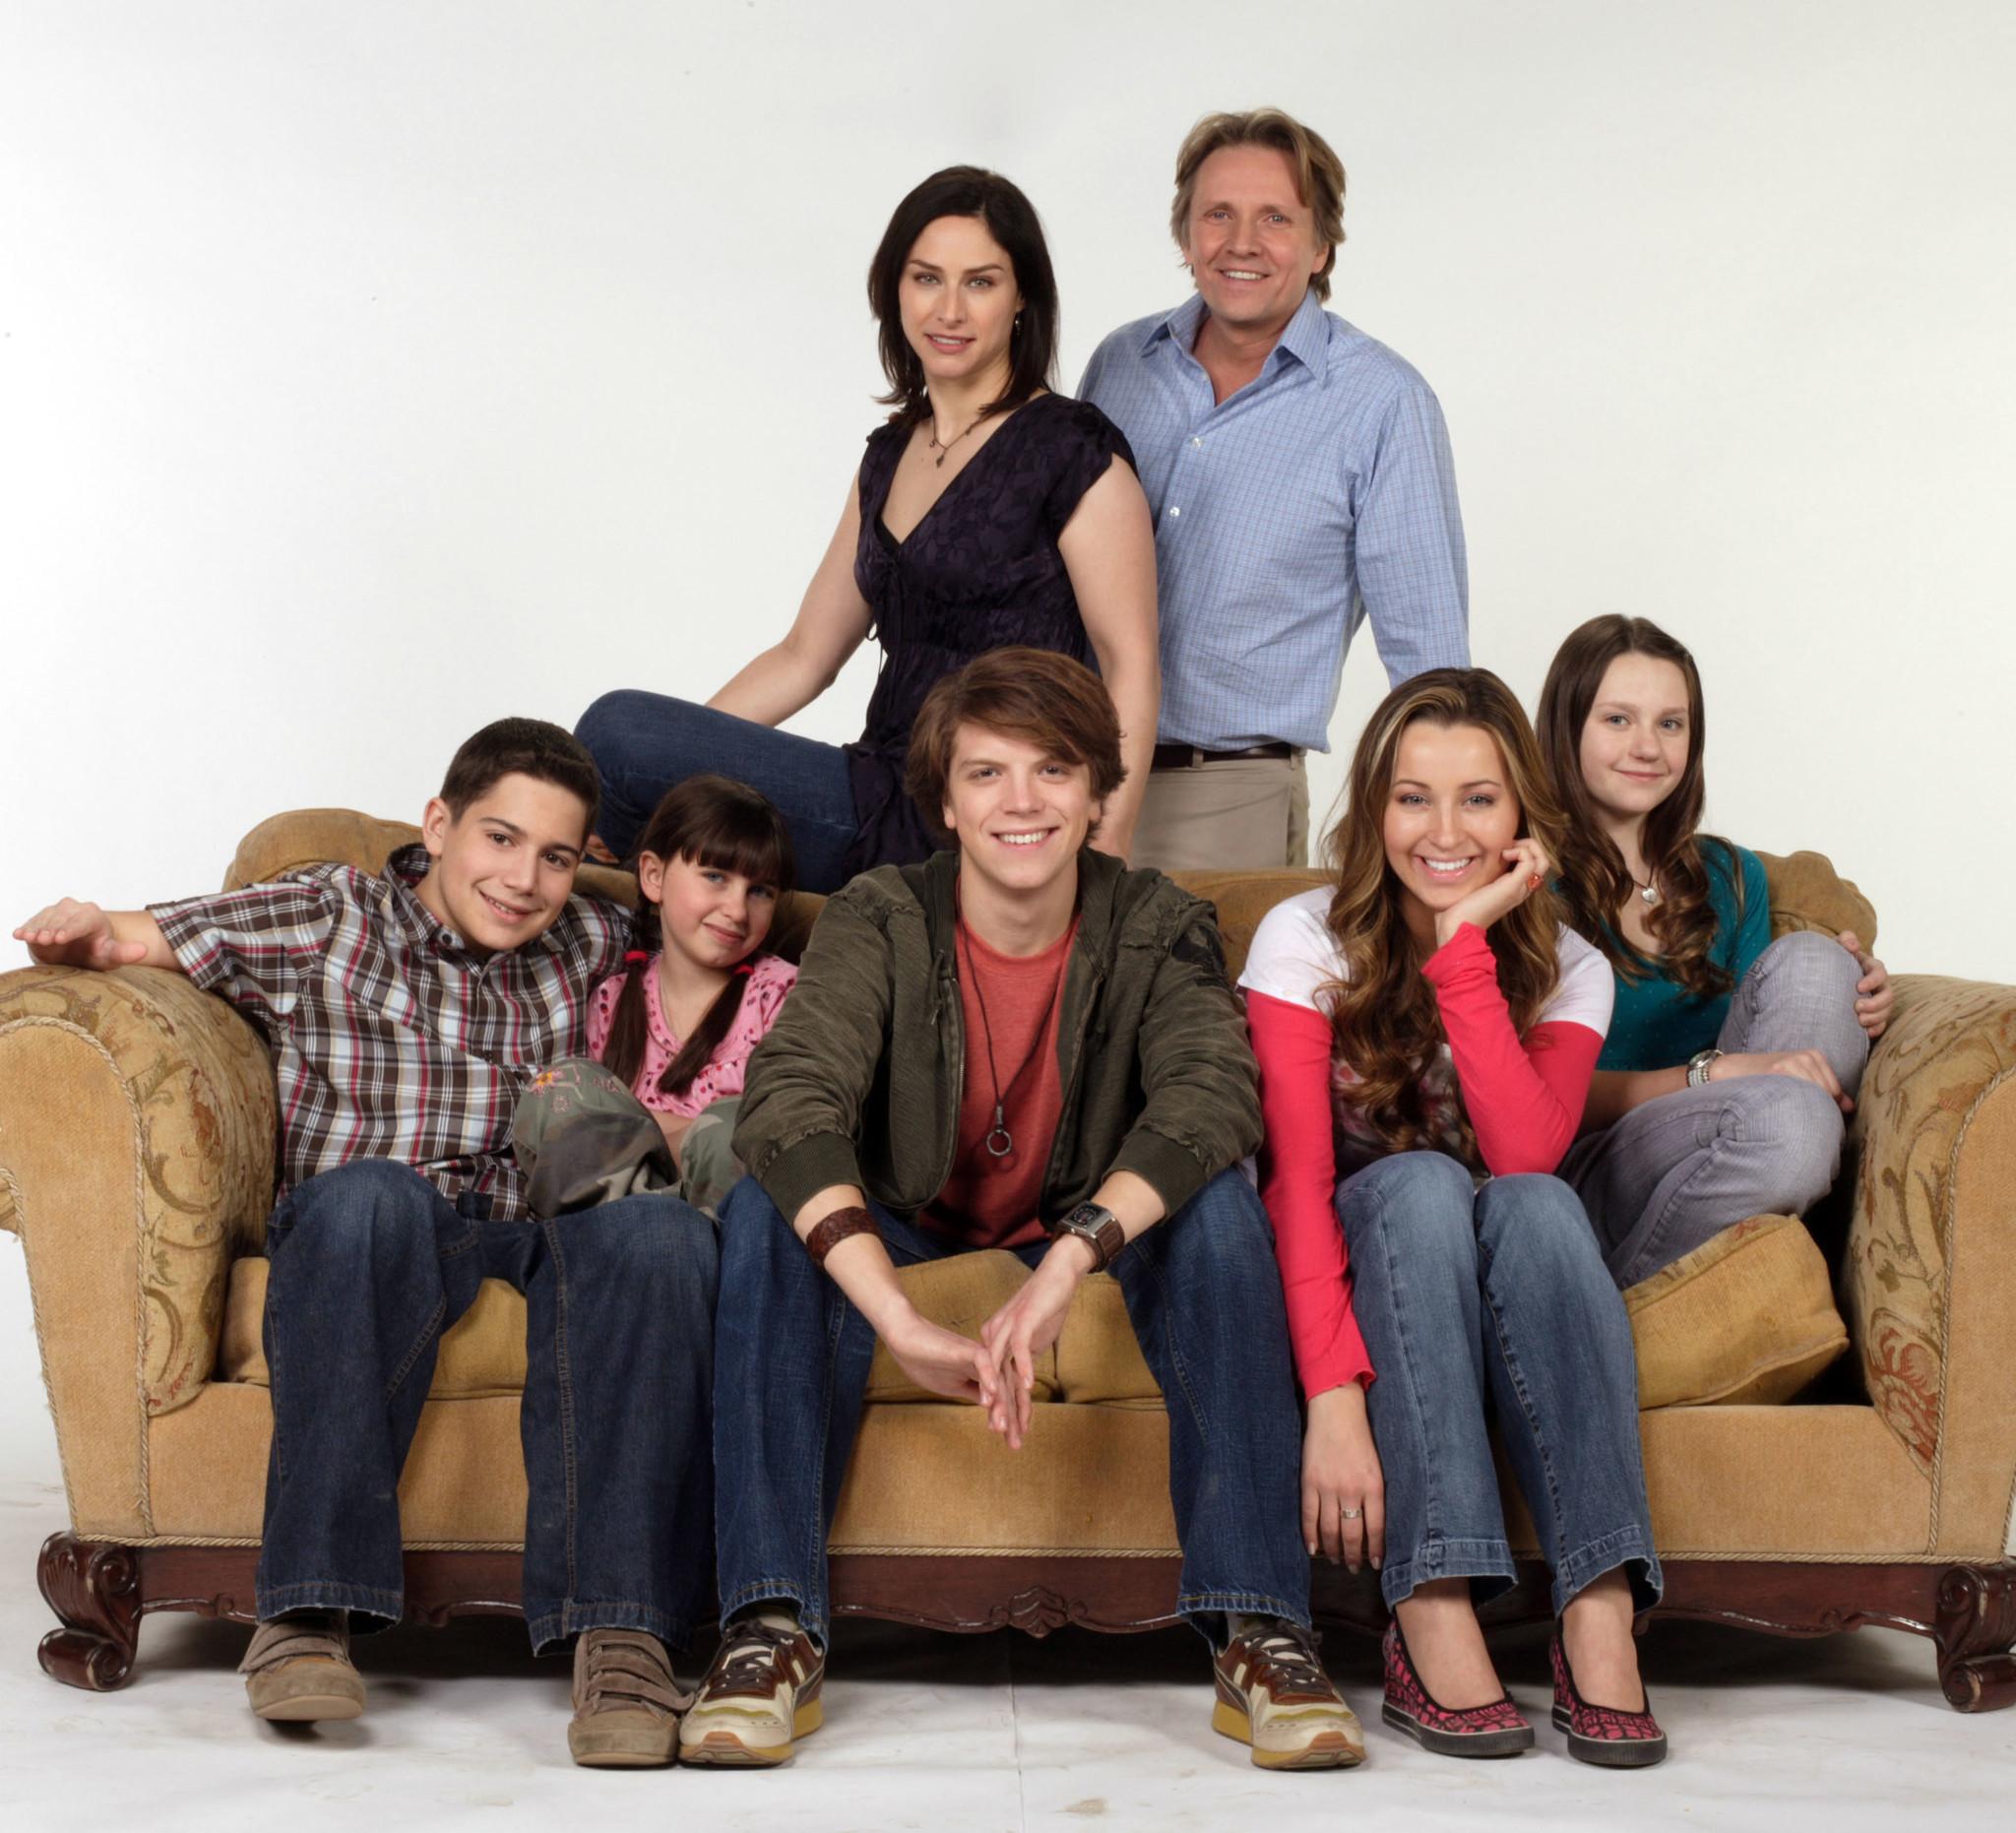 New 'Life with Derek' incest buzz decade after cancellation